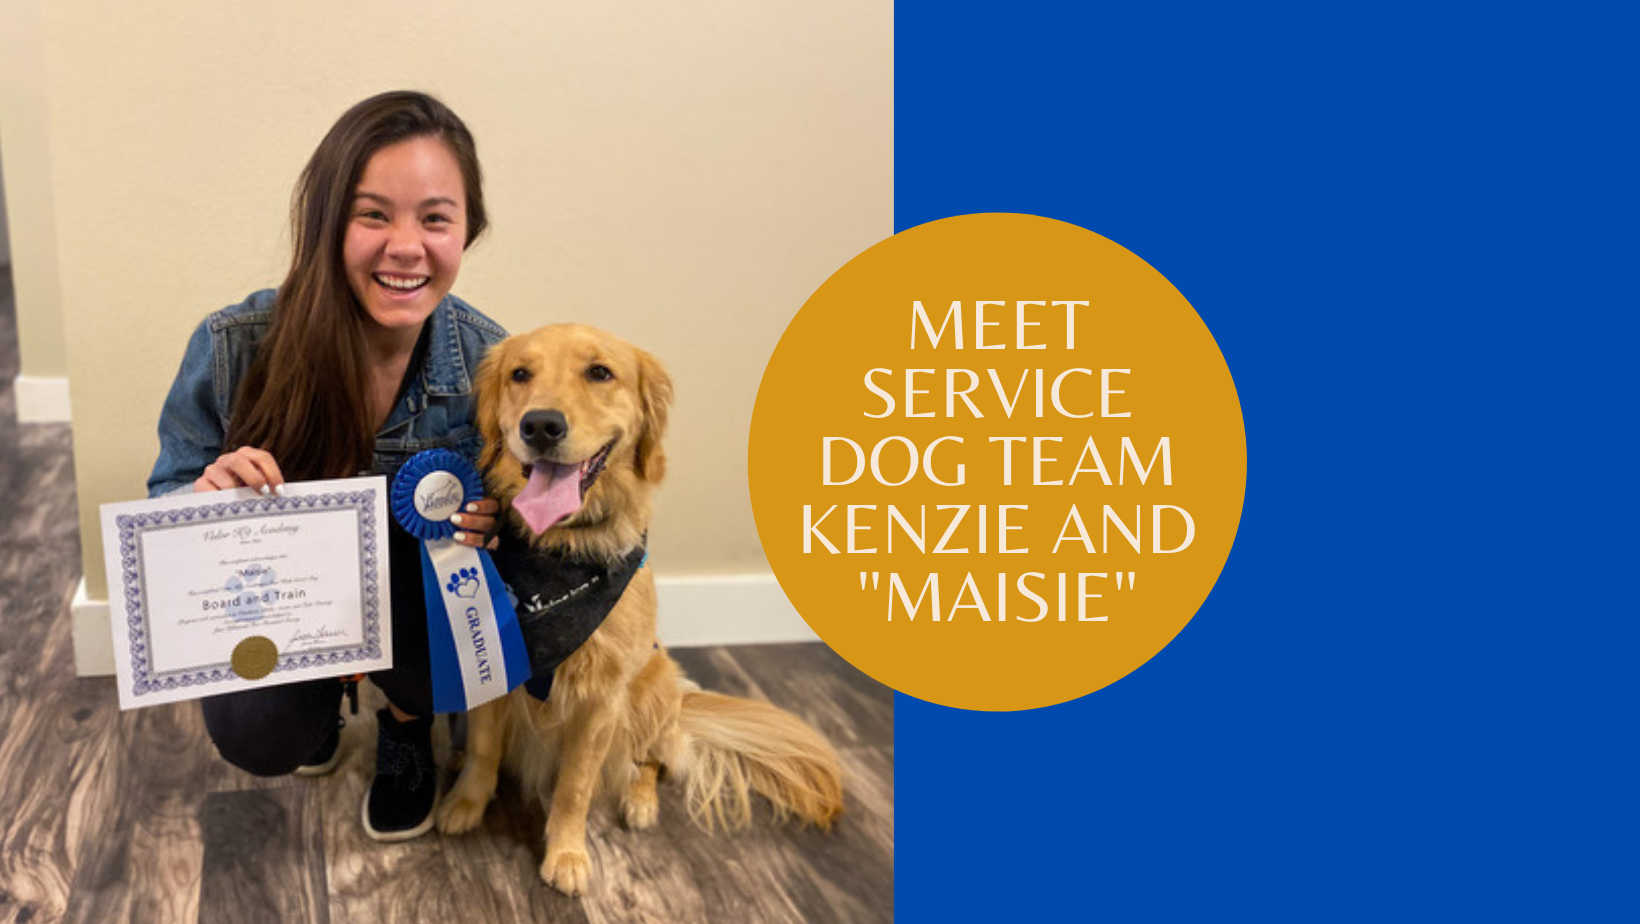 service dog team kenzie idaho